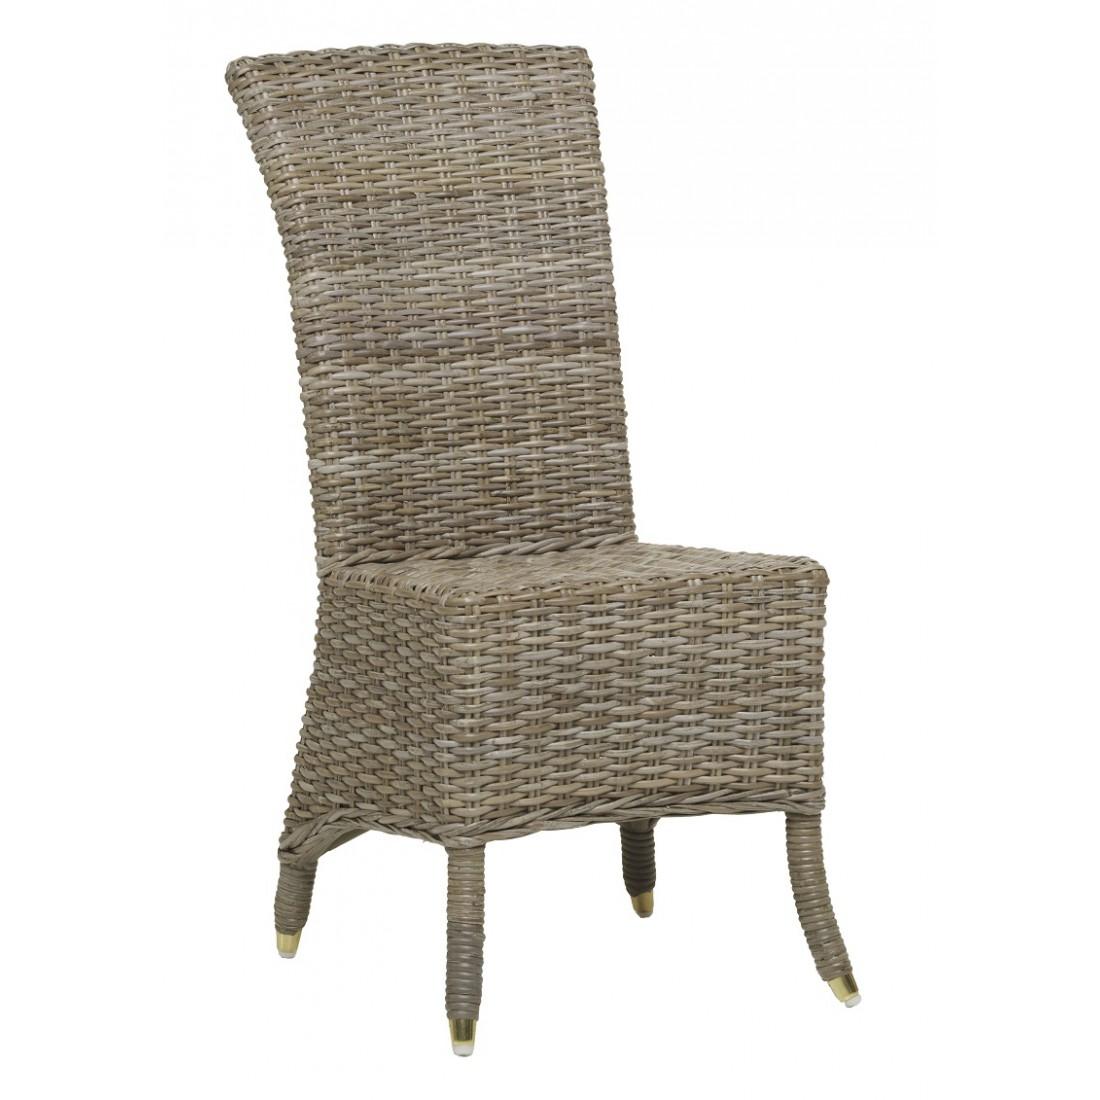 chaise en rotin amlie kooboo gris sans coussin loading zoom - Chaise En Osier